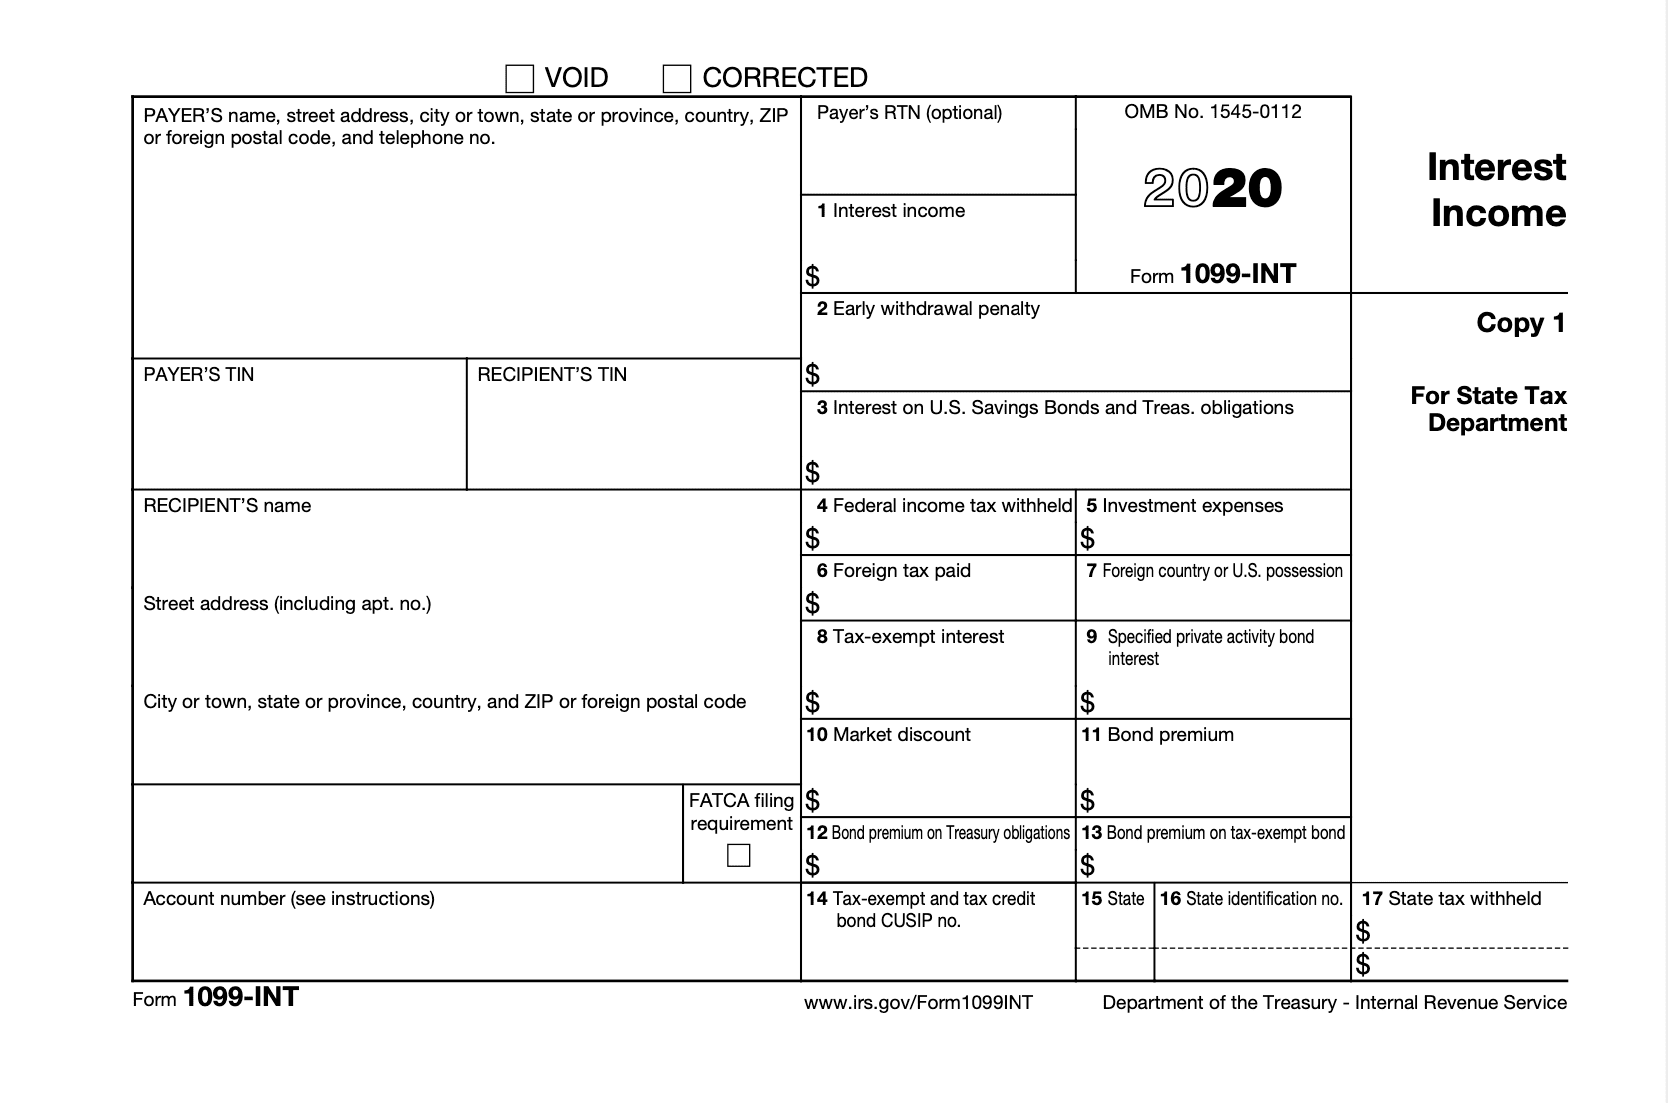 bank of america 1098 corrected